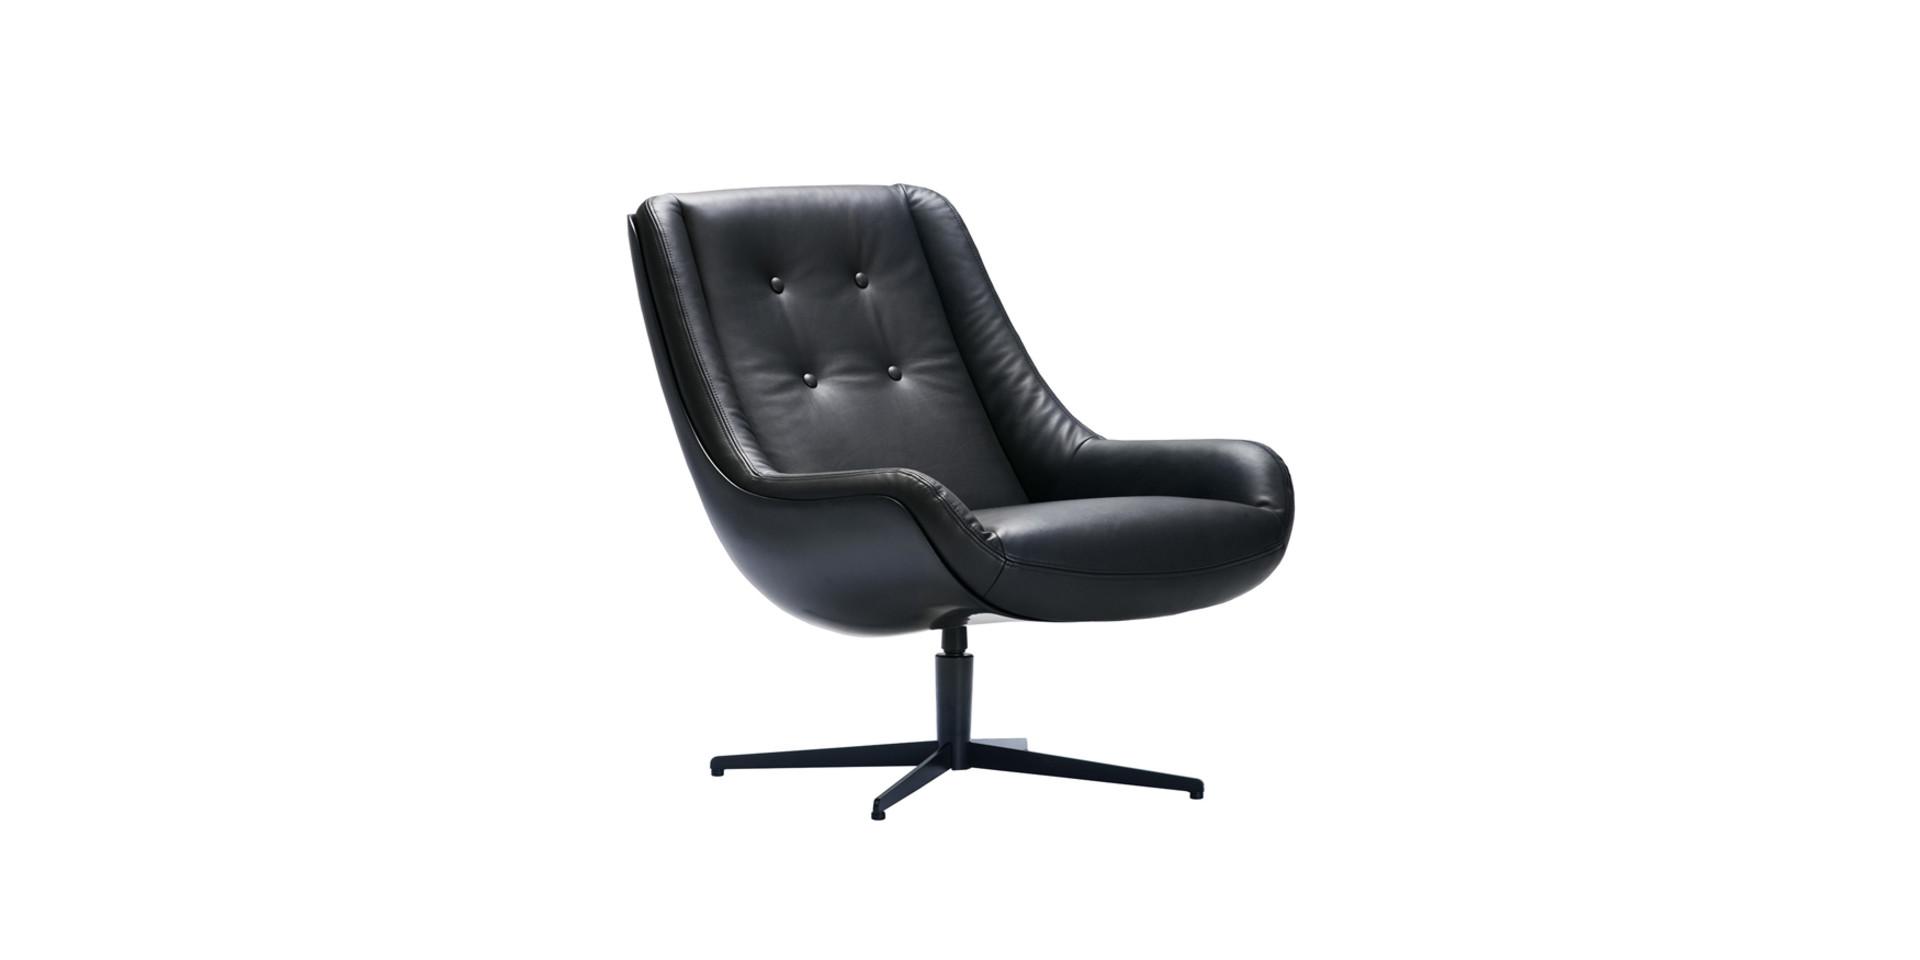 LOVEBIRD_armchair_swivel_black_buttons_aniline_black_2